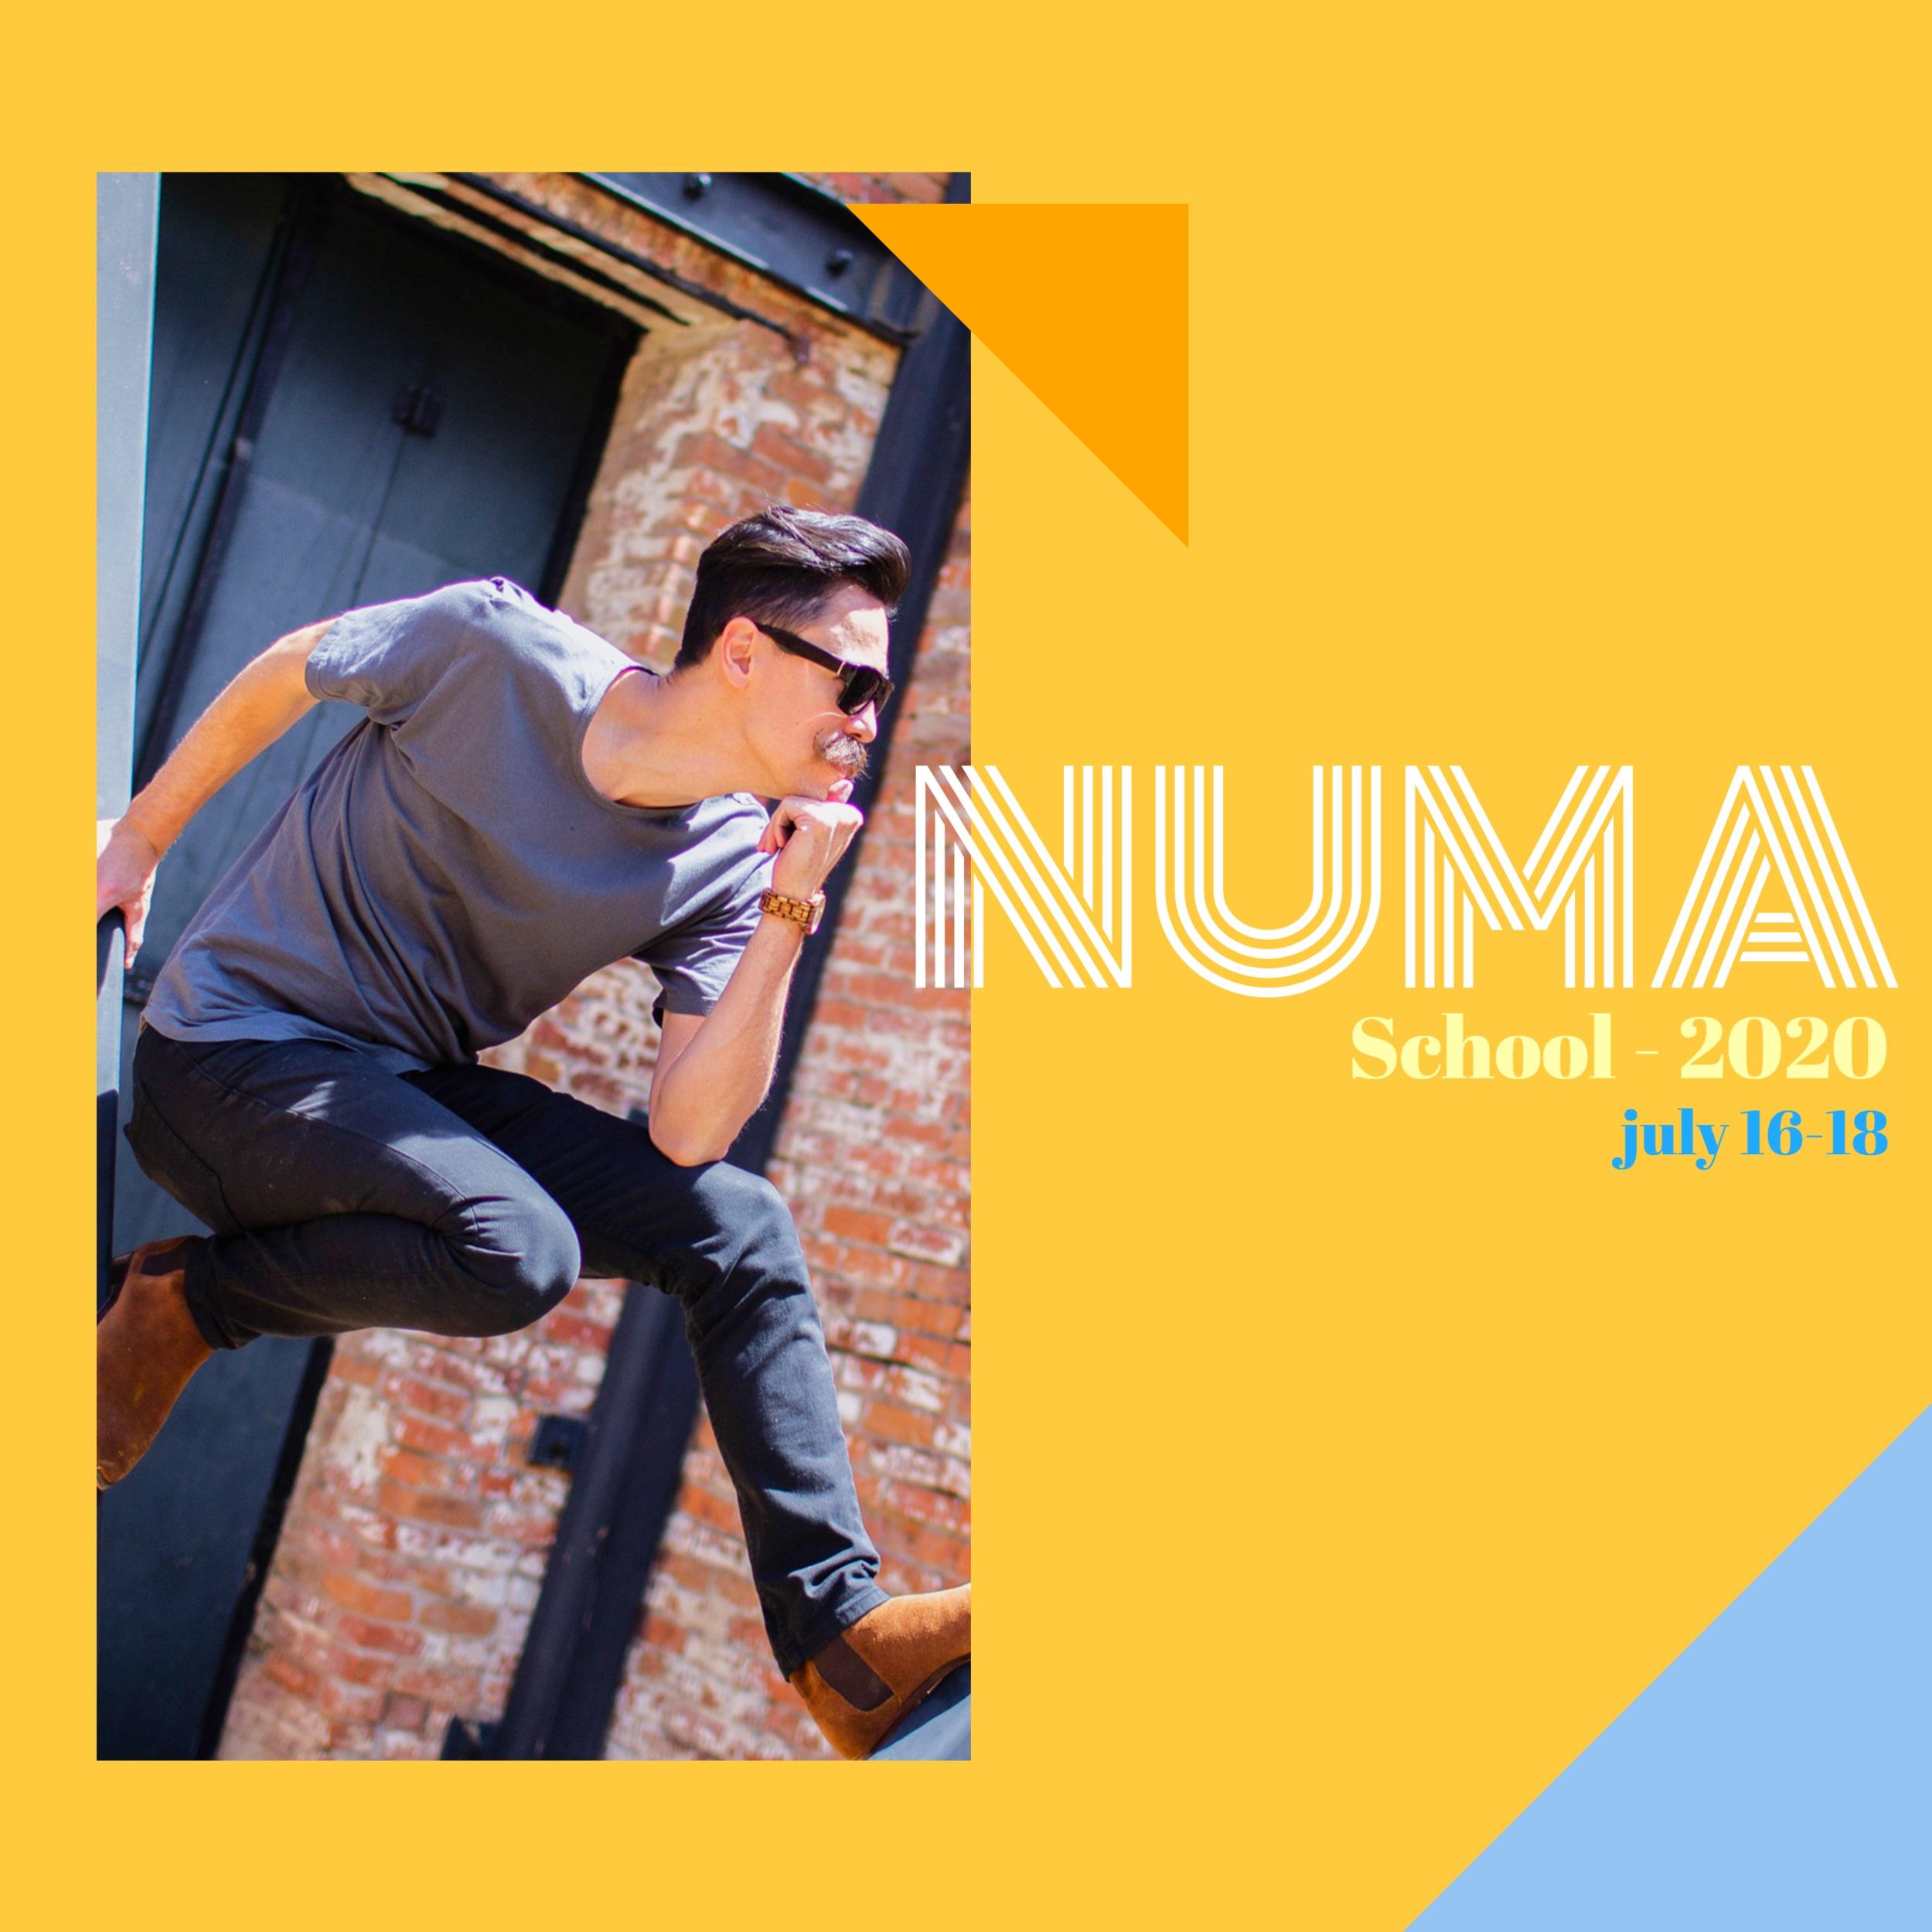 Numa+School+2020+SQUARE.jpg